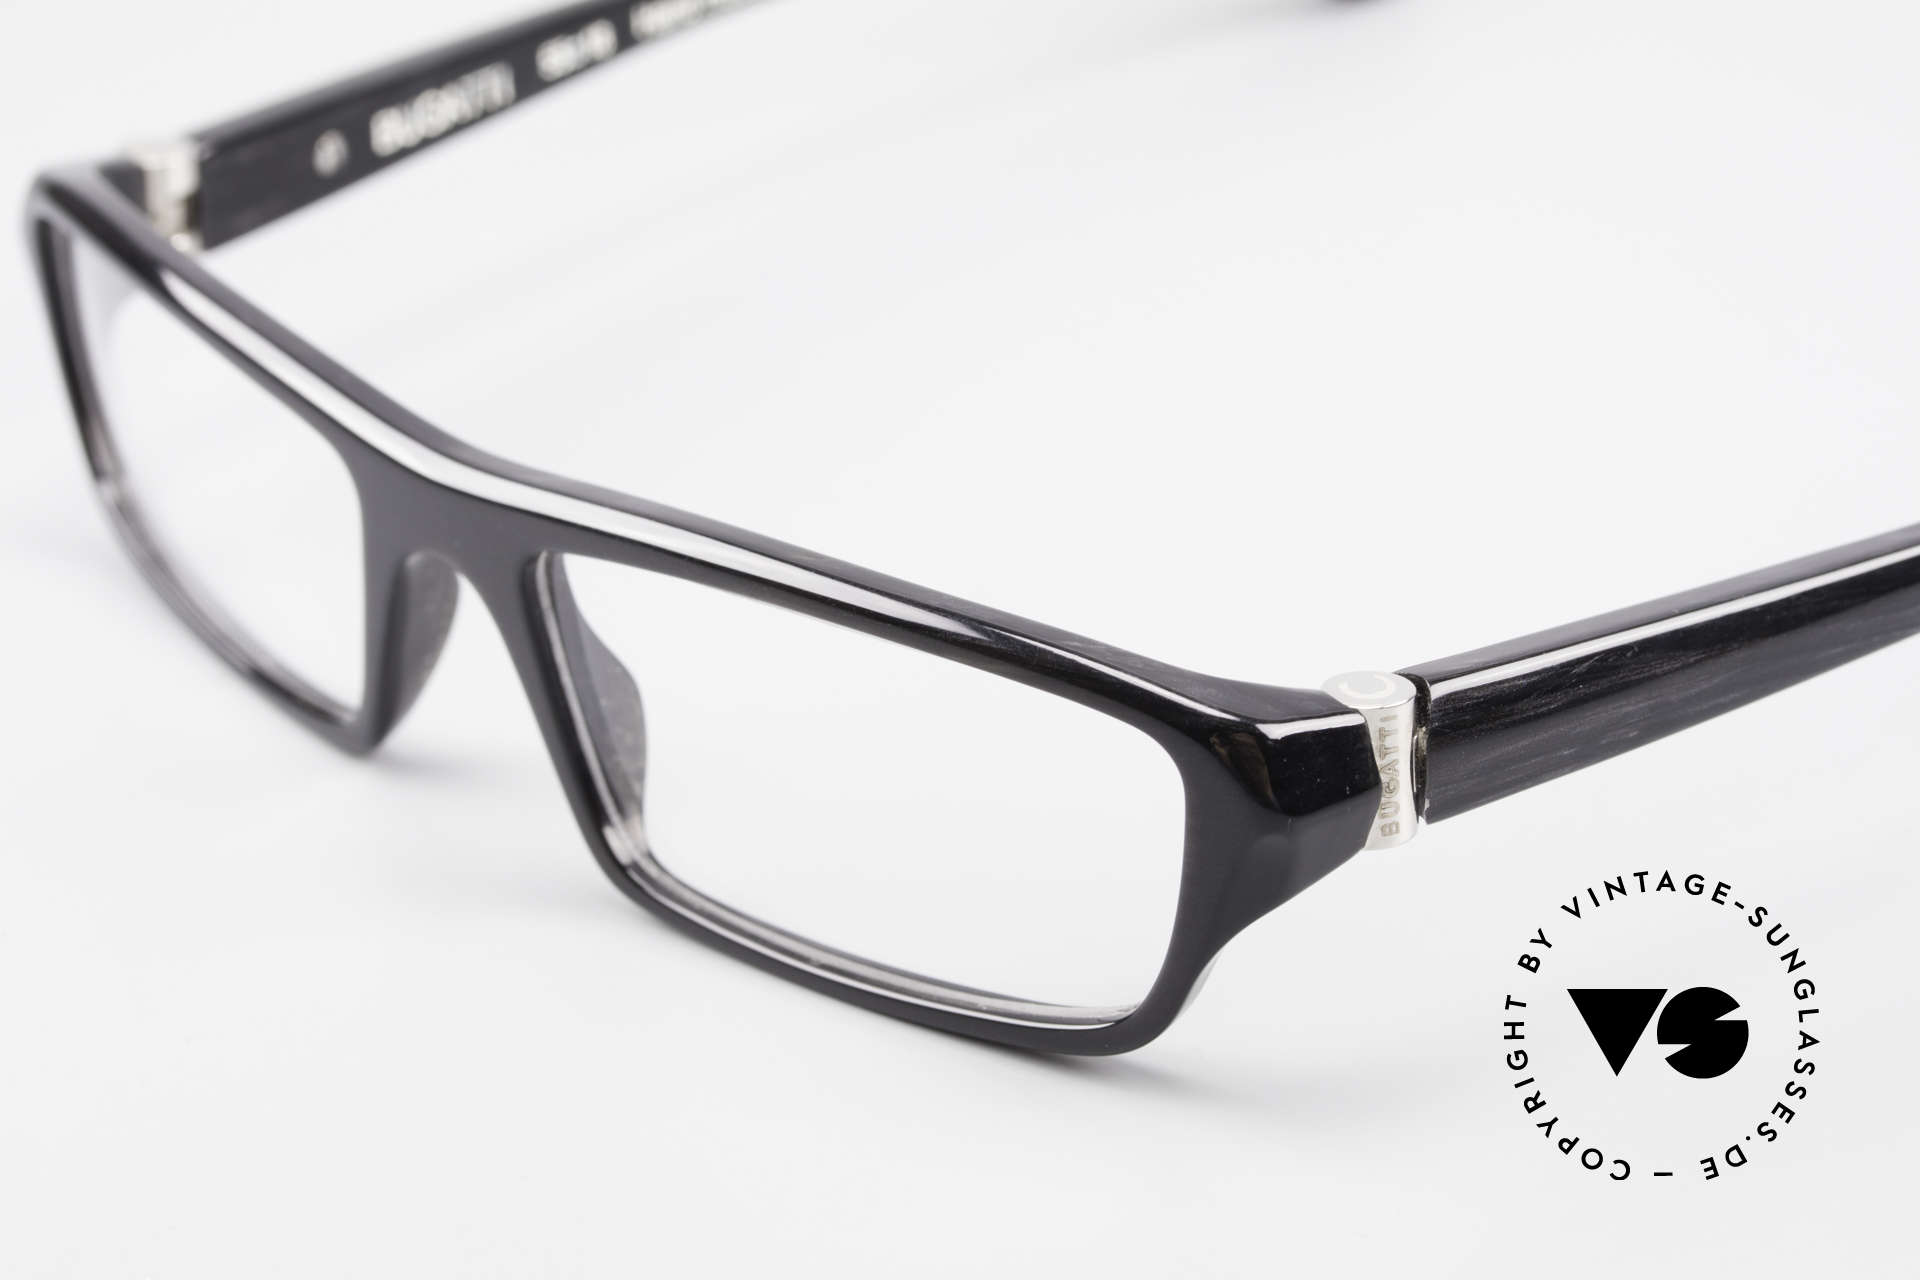 Bugatti 470 Limited Luxury Eyeglasses Men, true rarity (limited-lot production by Bugatti), Made for Men